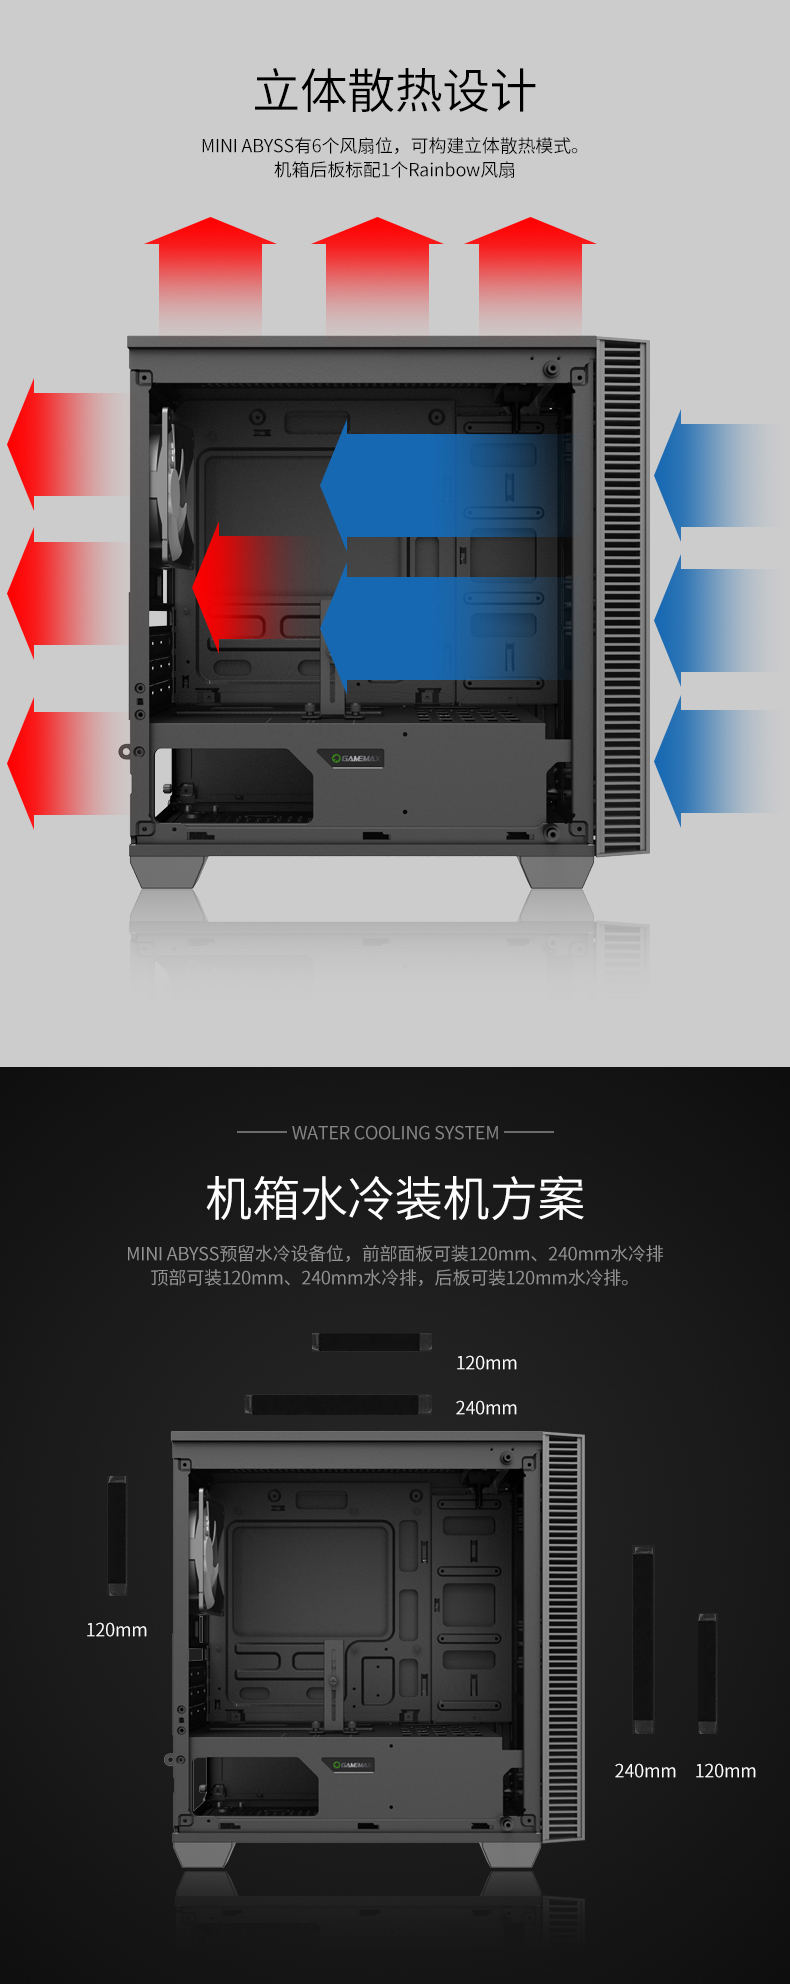 GAMEMAX_MINI-ABYSS-H608详情页中文_08.jpg